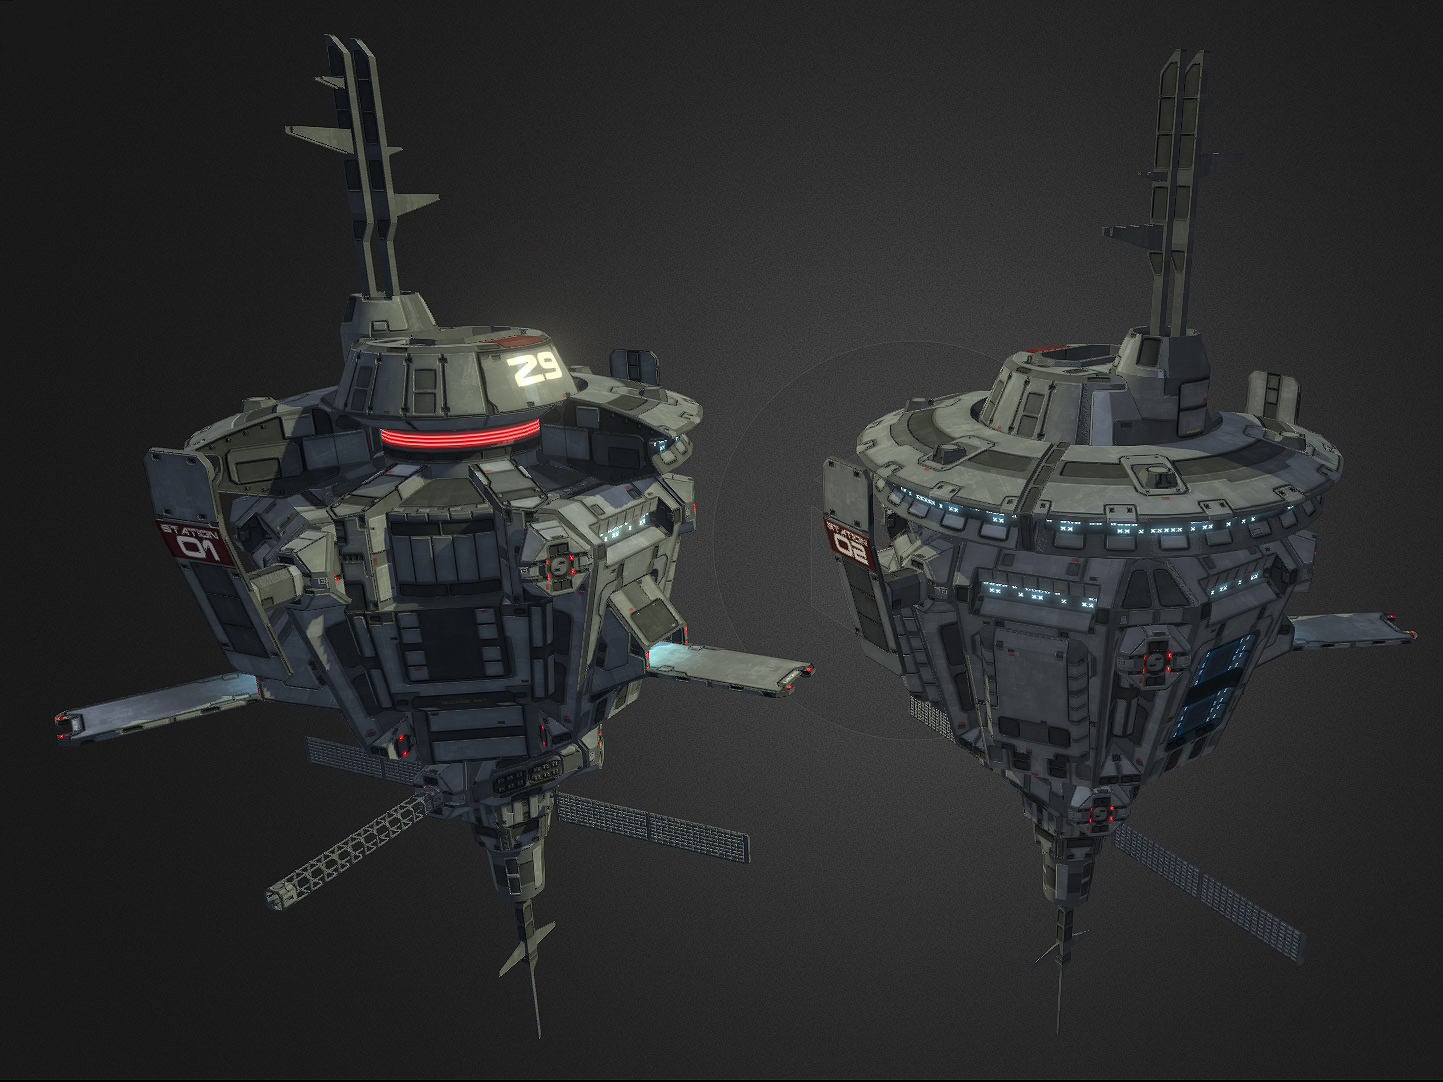 Space Station LOWPOLY by NovA29R on DeviantArt